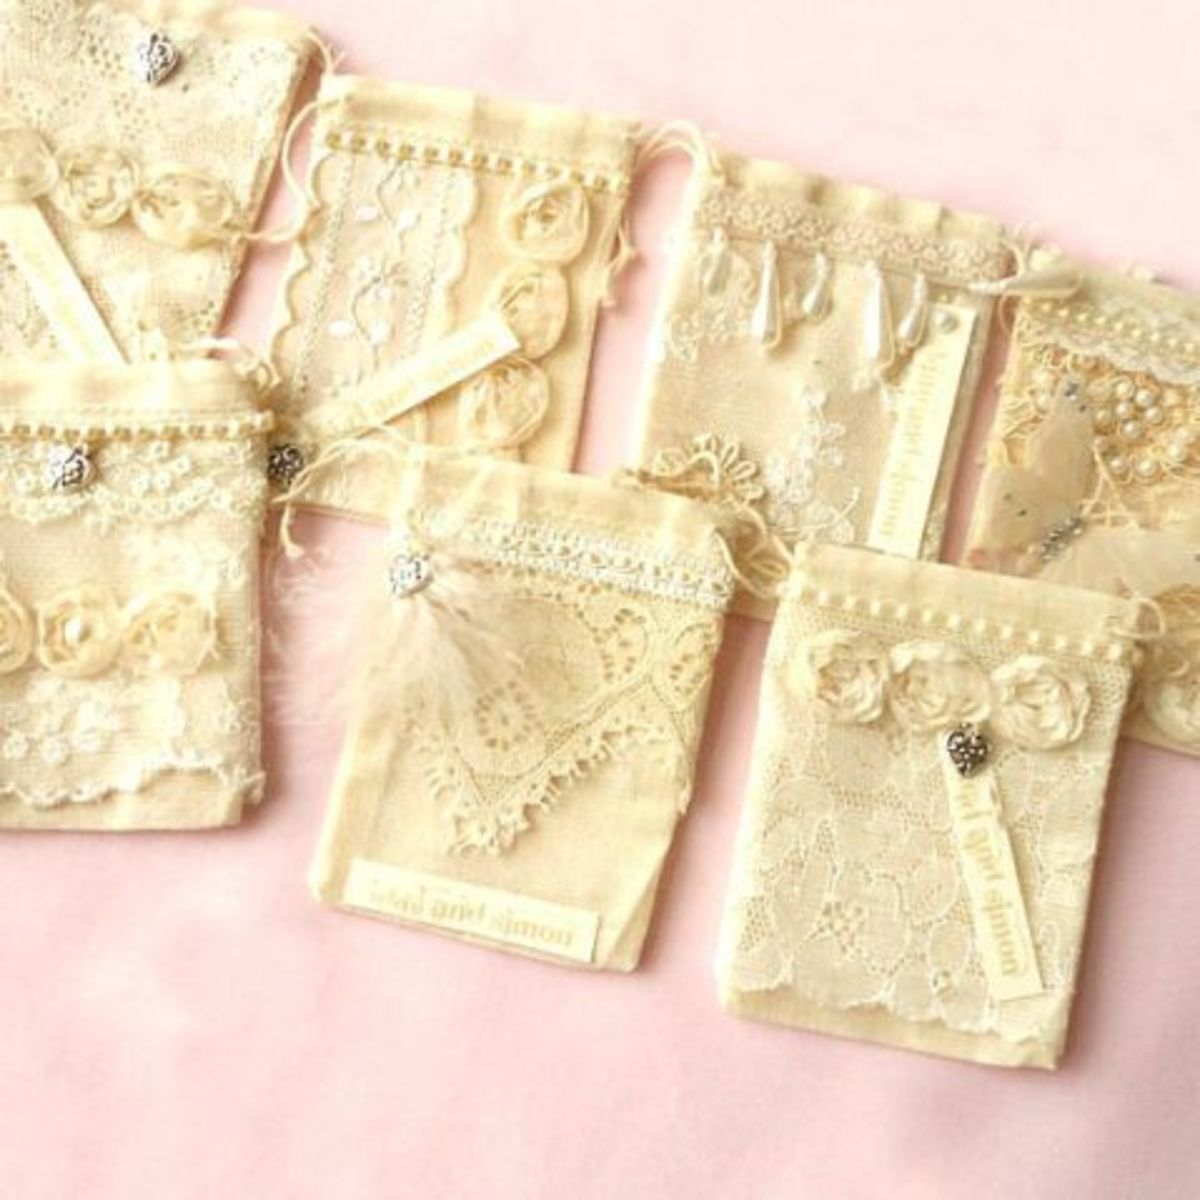 Lace wedding favor bags